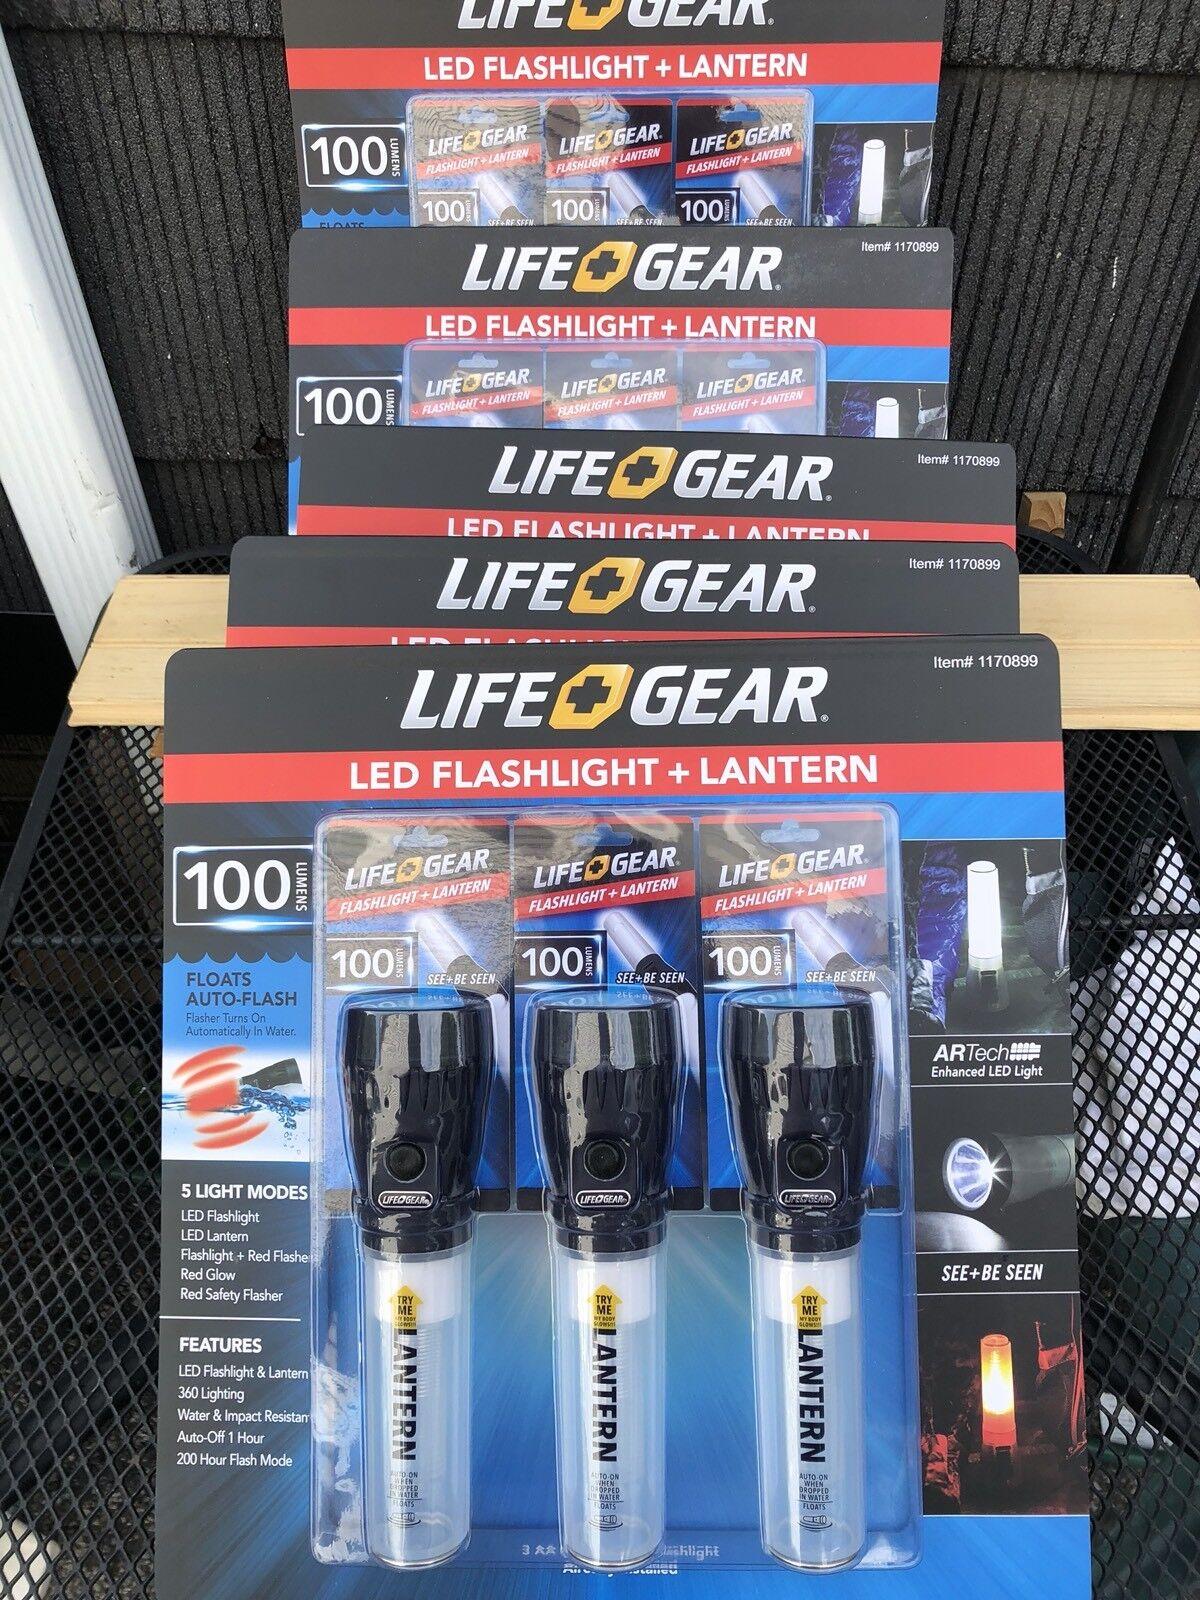 5X 3PK New Life Gear Linterna Led + Linterna 100 lumens agua y resistente al impacto